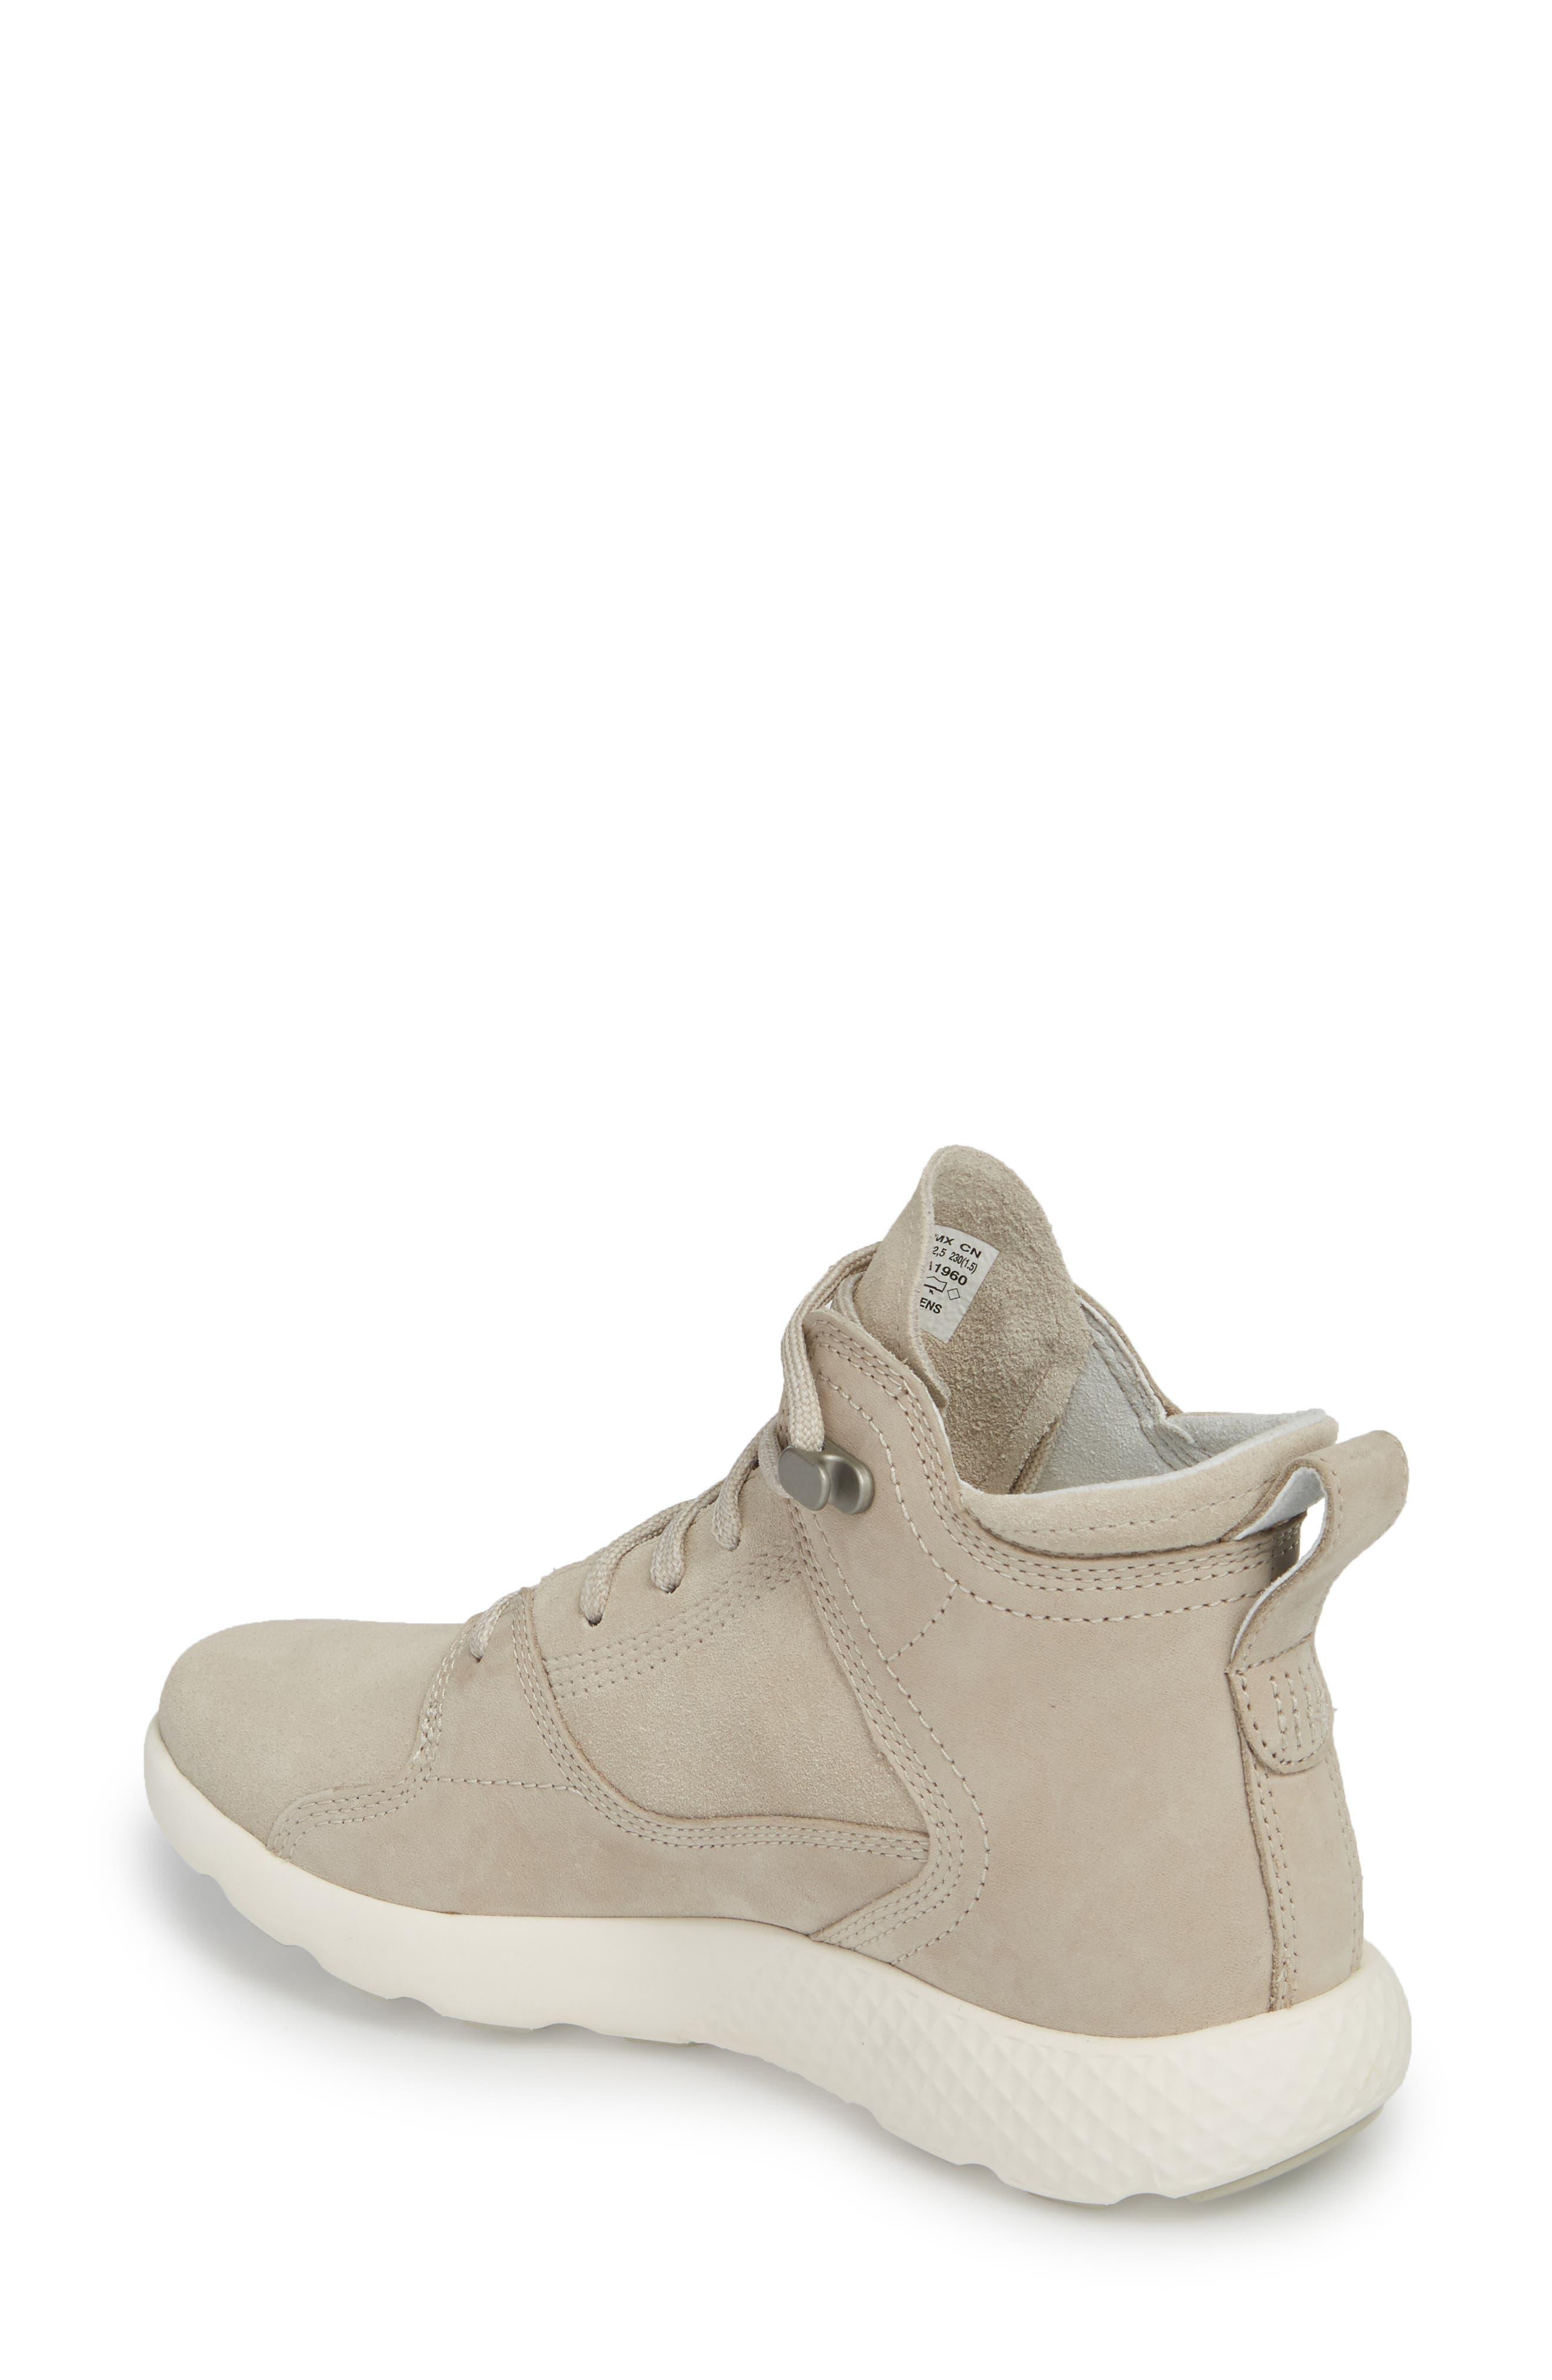 FlyRoam Sneaker,                             Alternate thumbnail 2, color,                             Pure Cashmere Leather